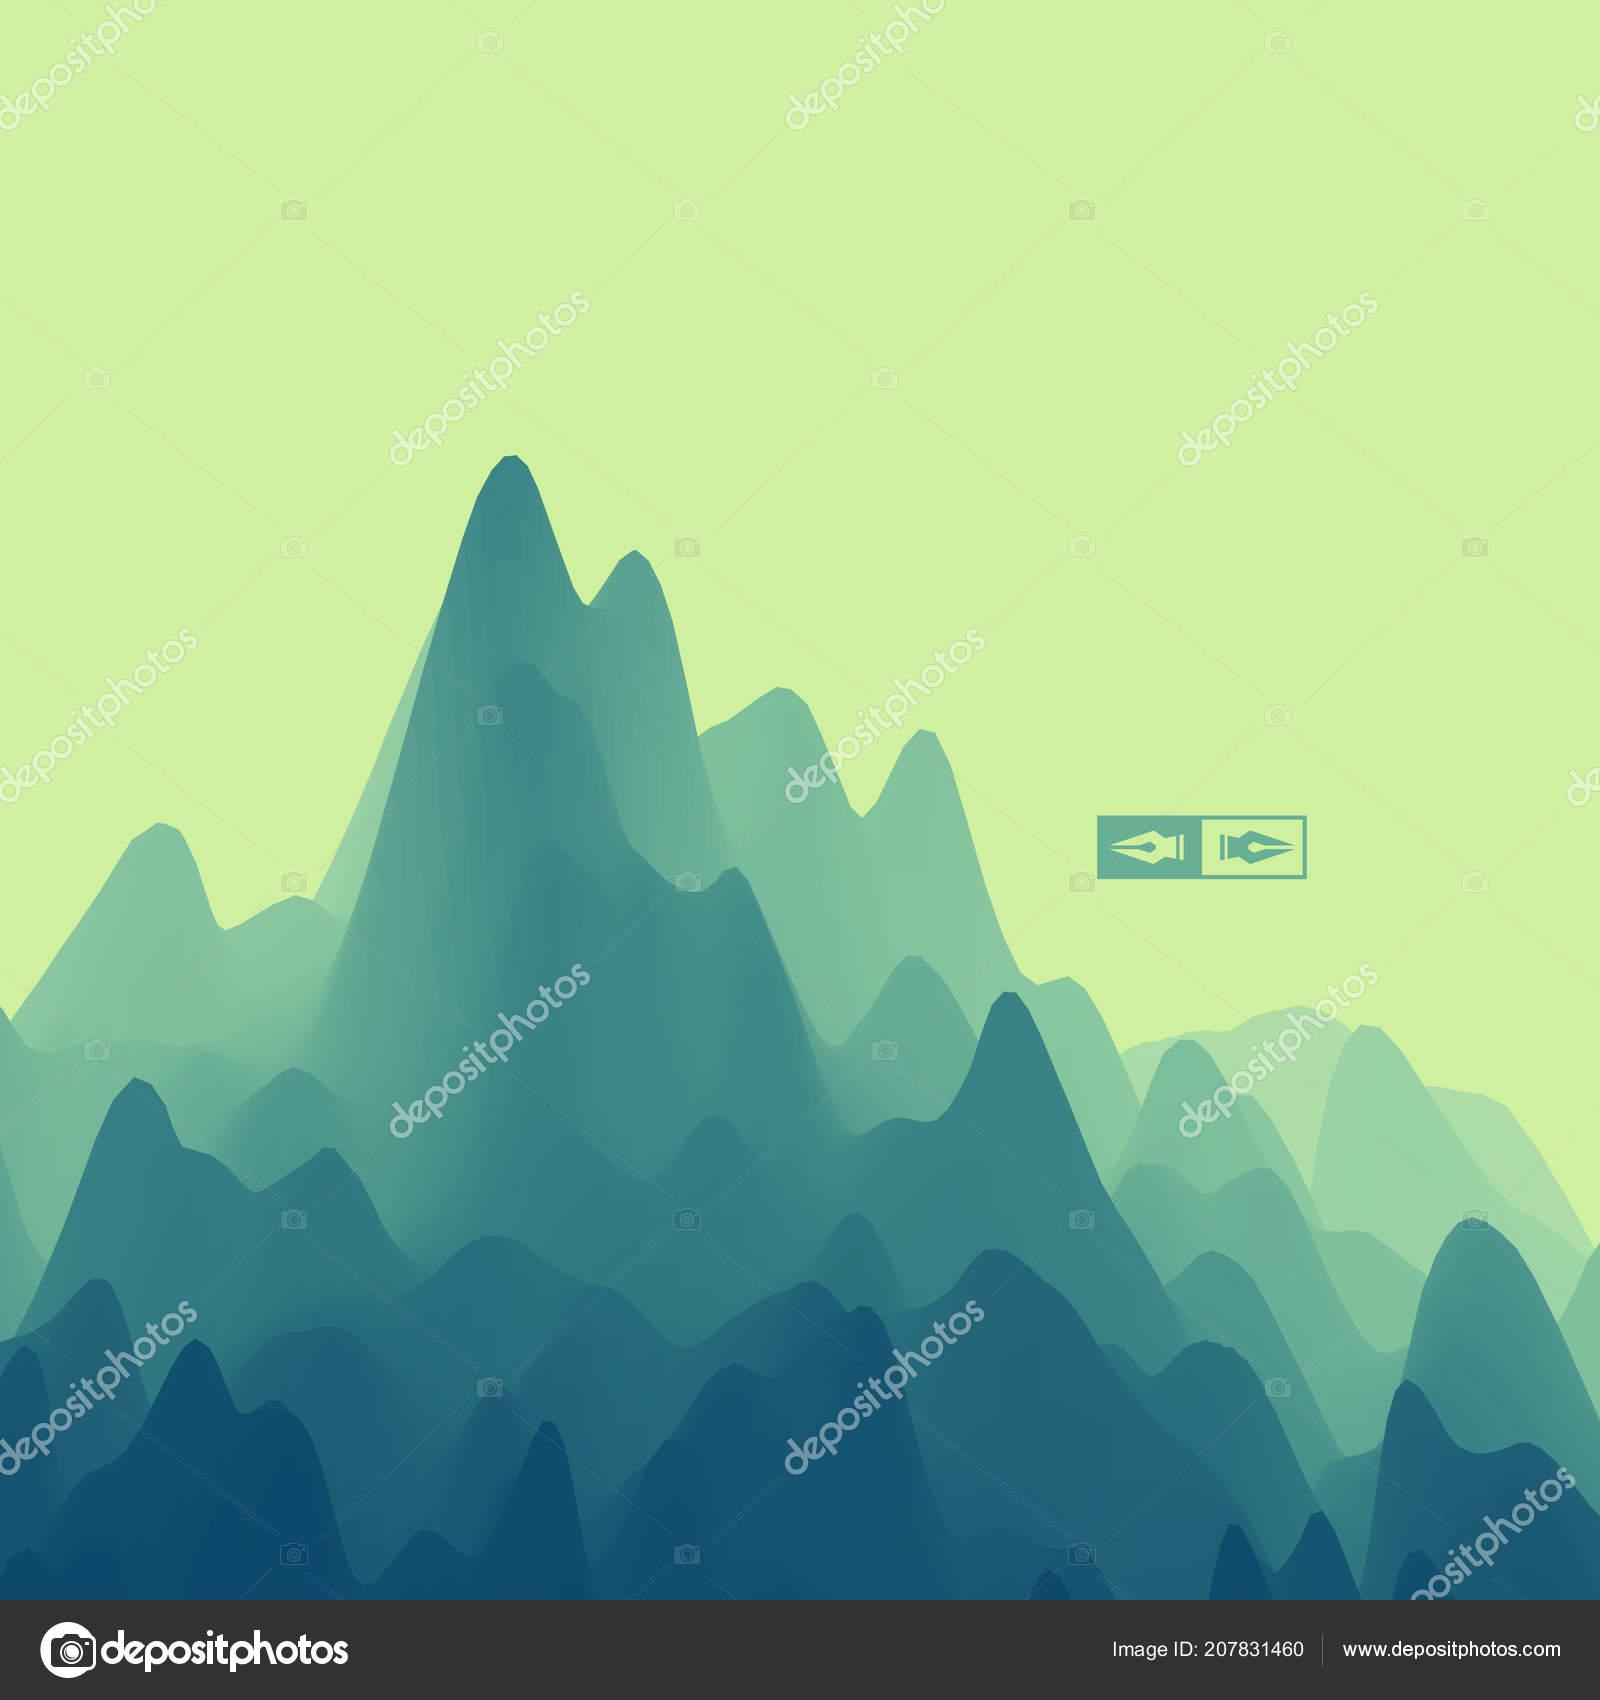 Paisaje Montaña Terreno Montañoso Ilustración Vector Resumen ...